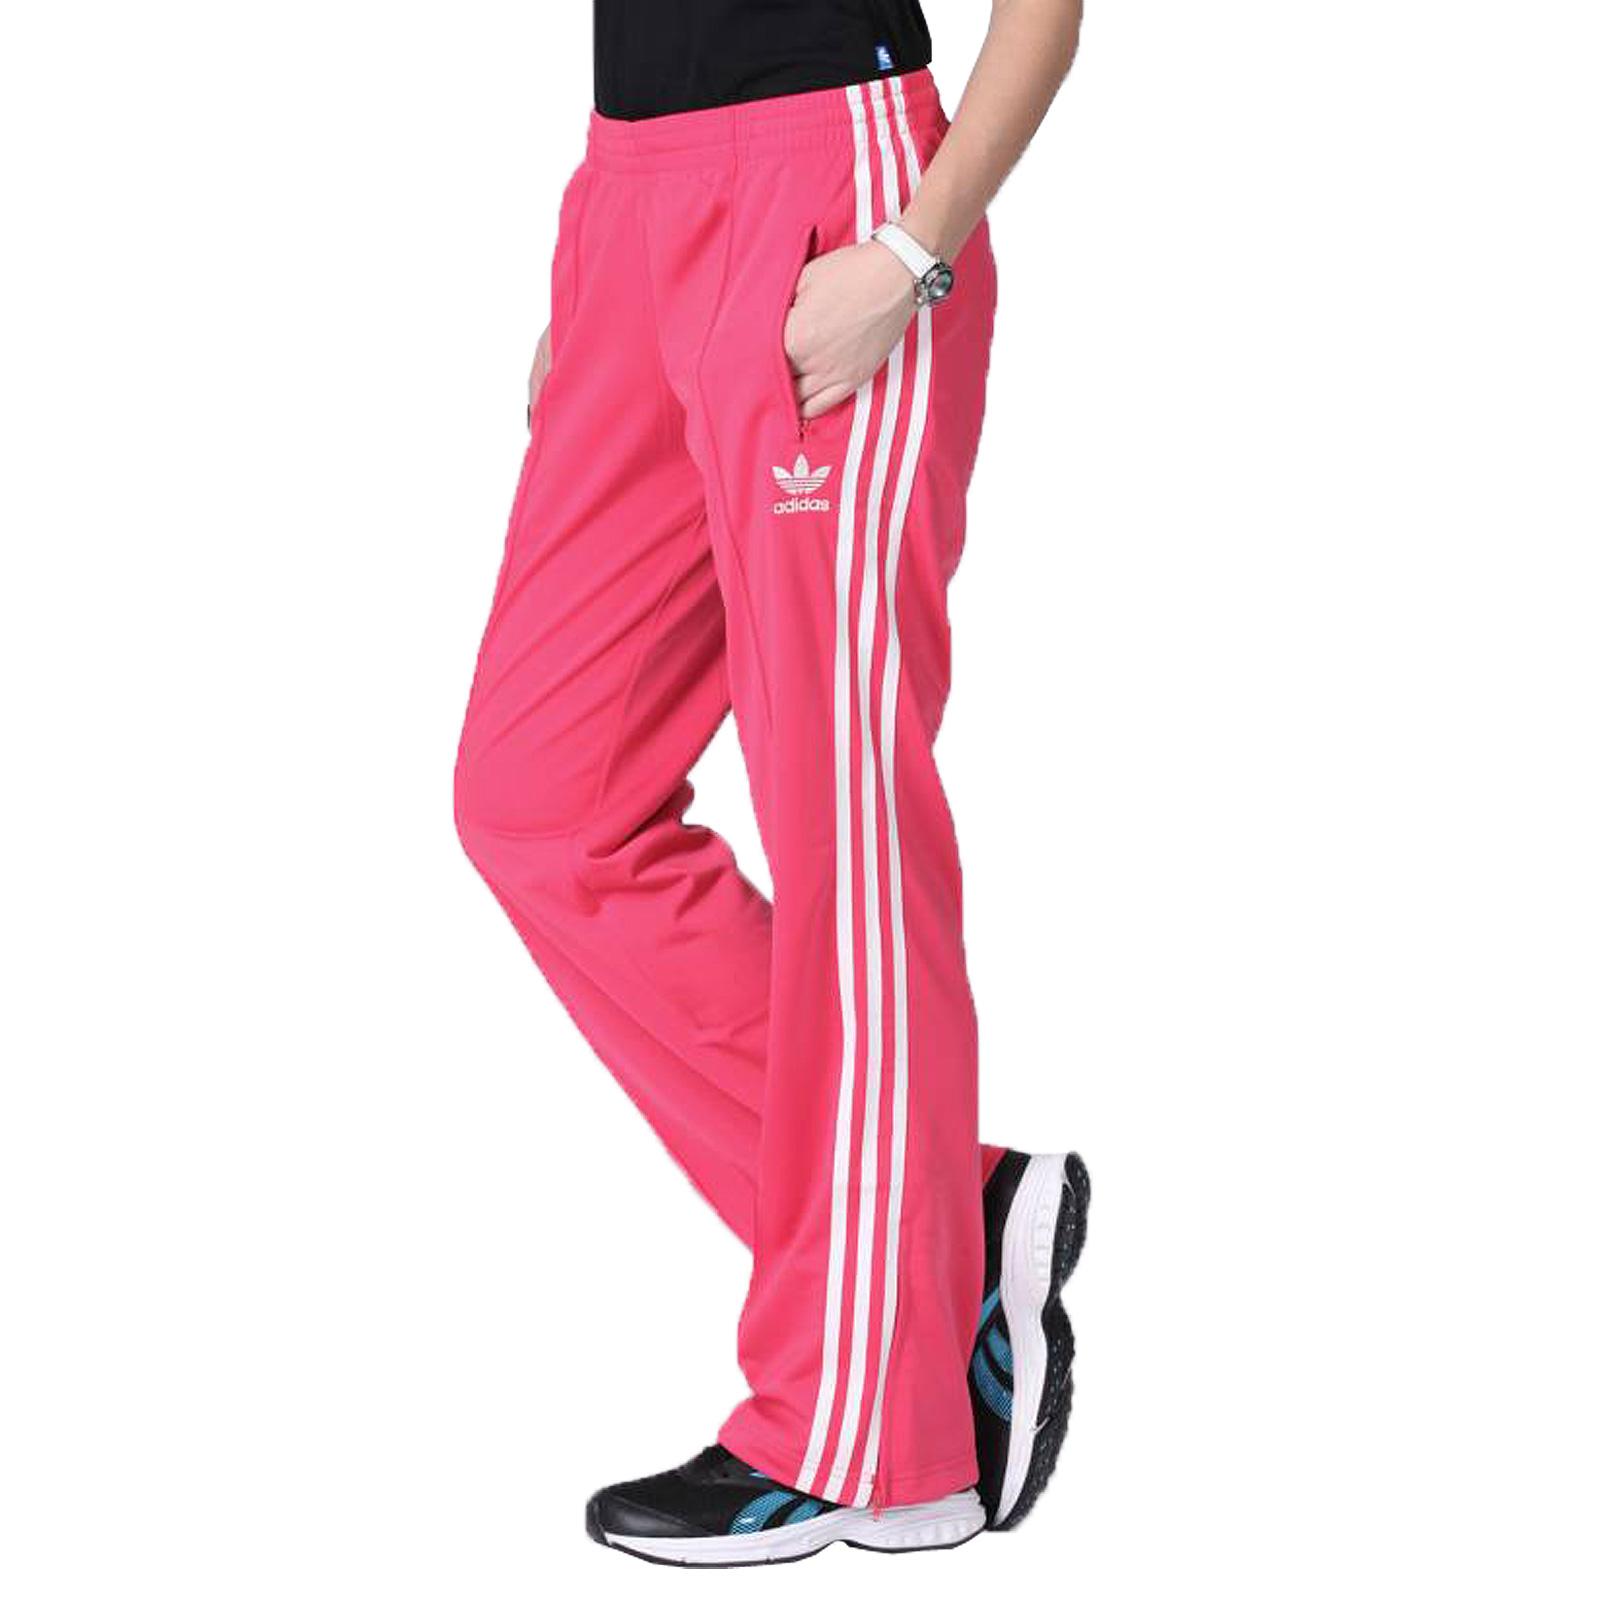 new high order online low cost adidas Originals Firebird TP Track Pants Damen Trainingshose Sporthose Pink  Weiß